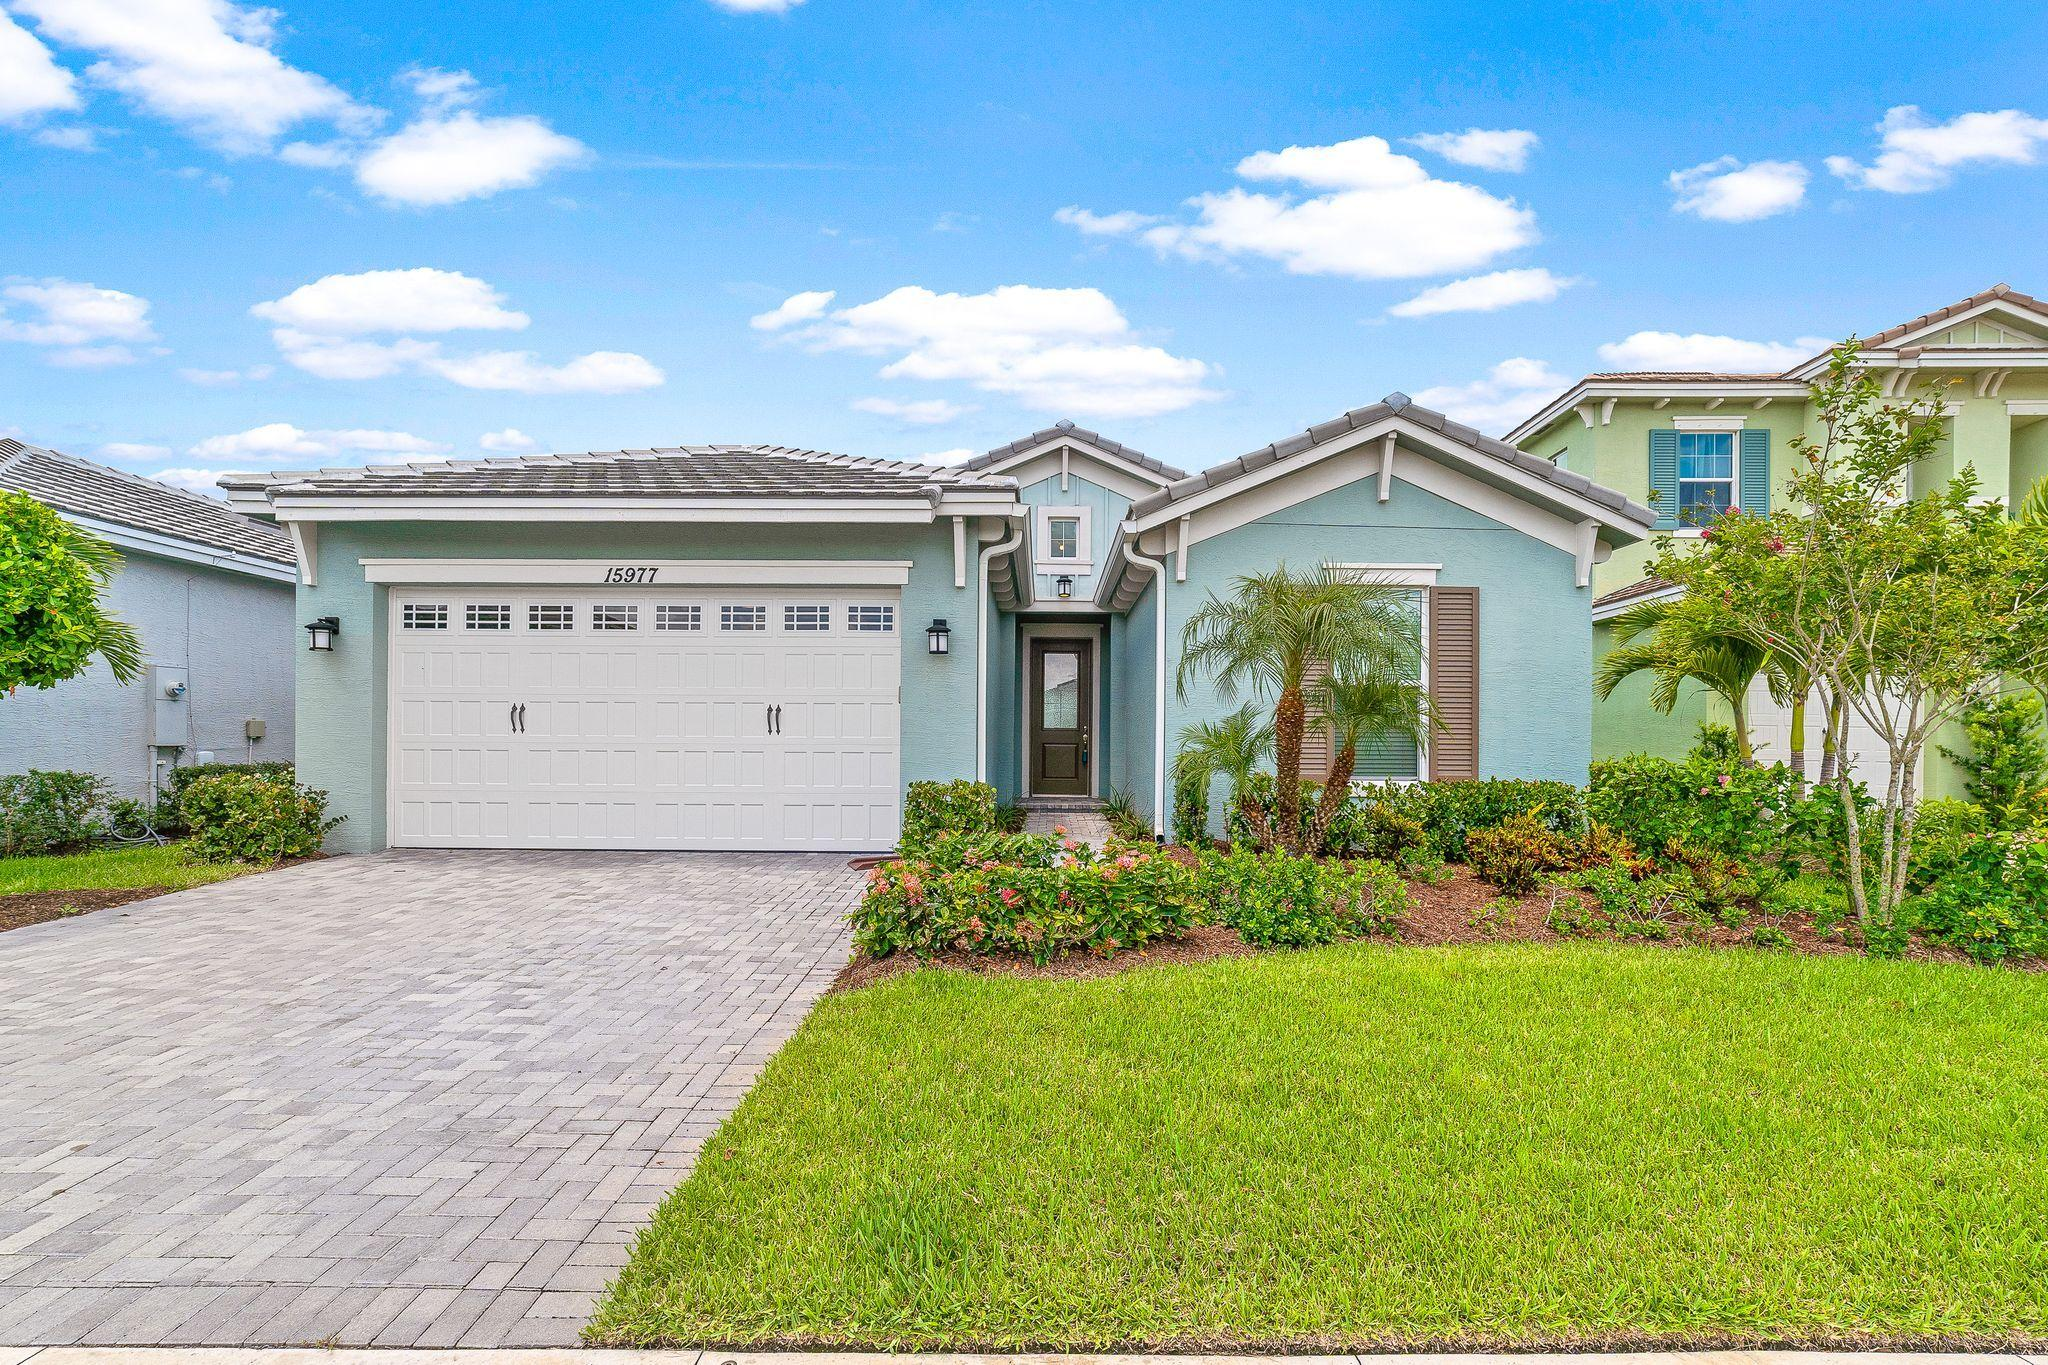 Home for sale in Westlake Westlake Florida